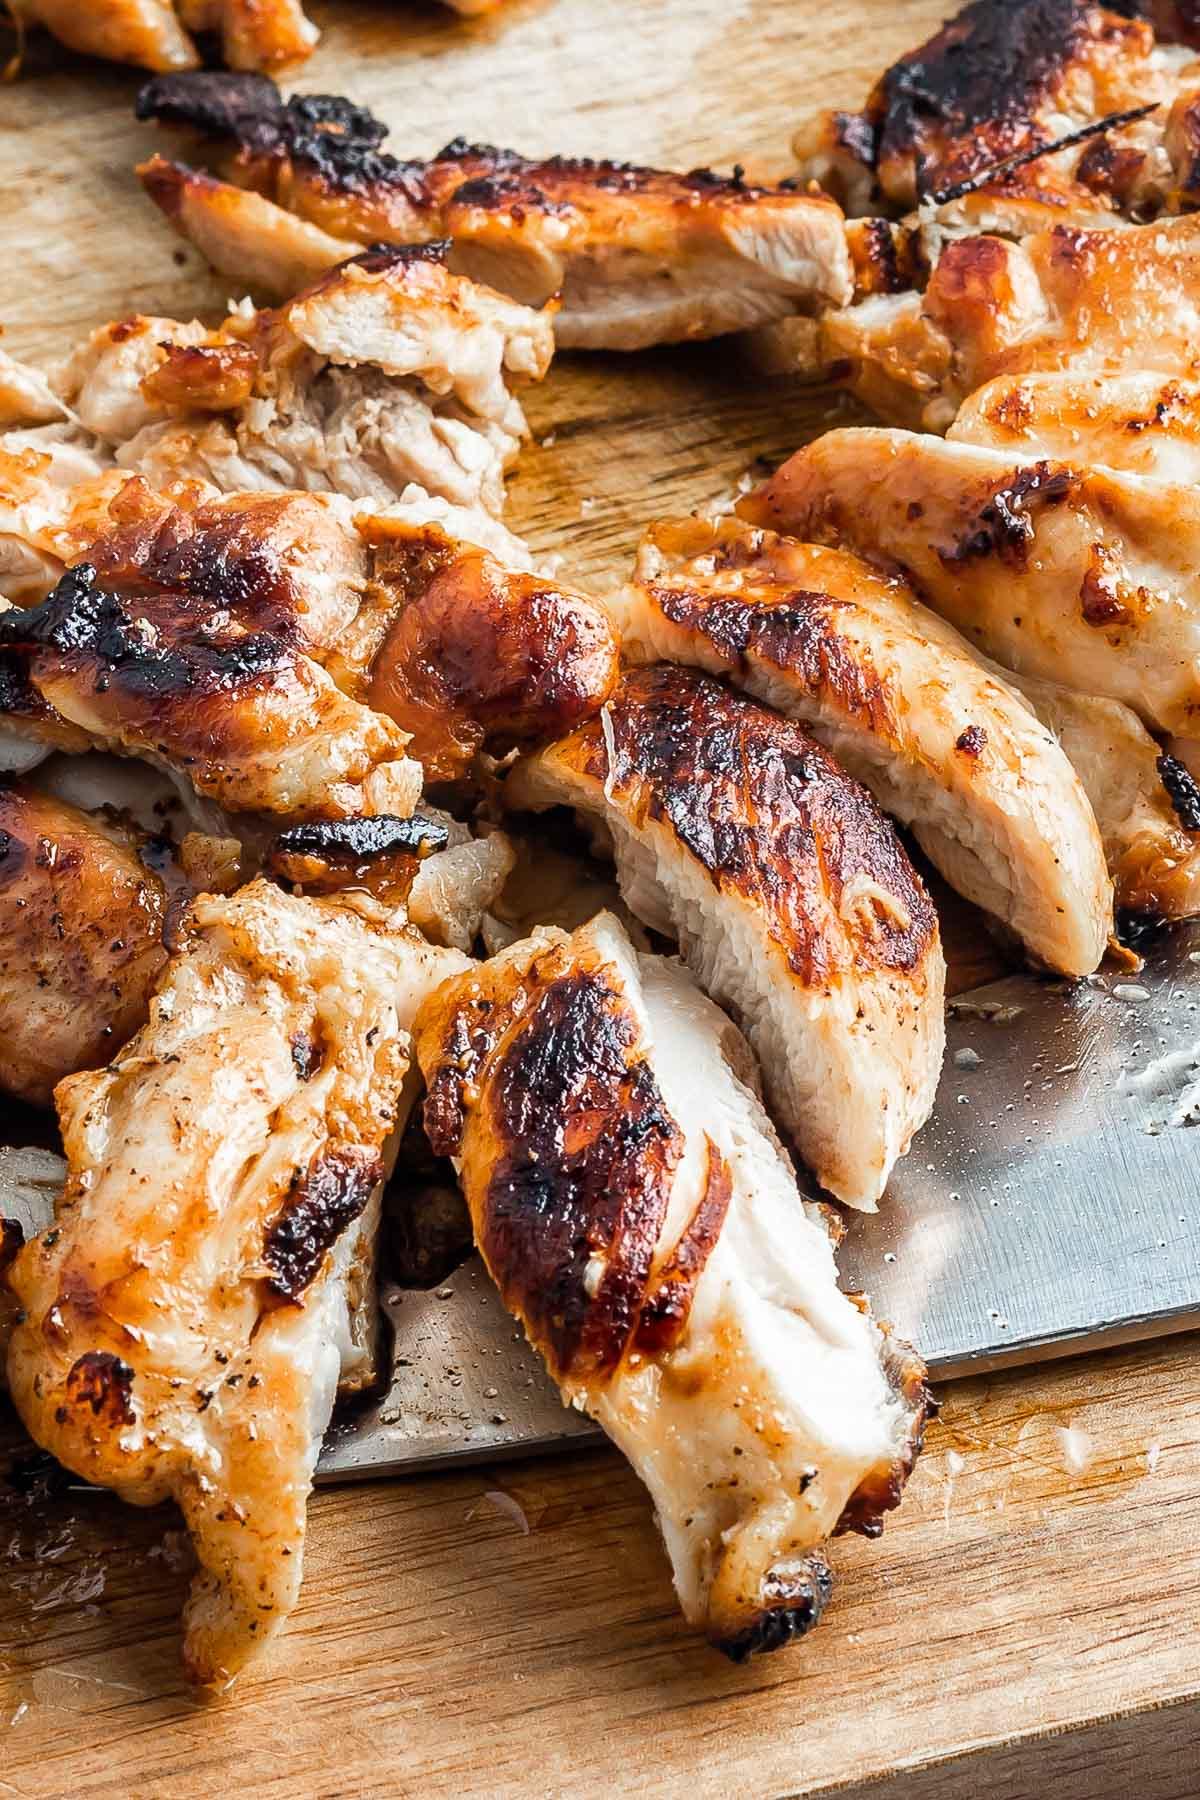 cooked lemongrass chicken